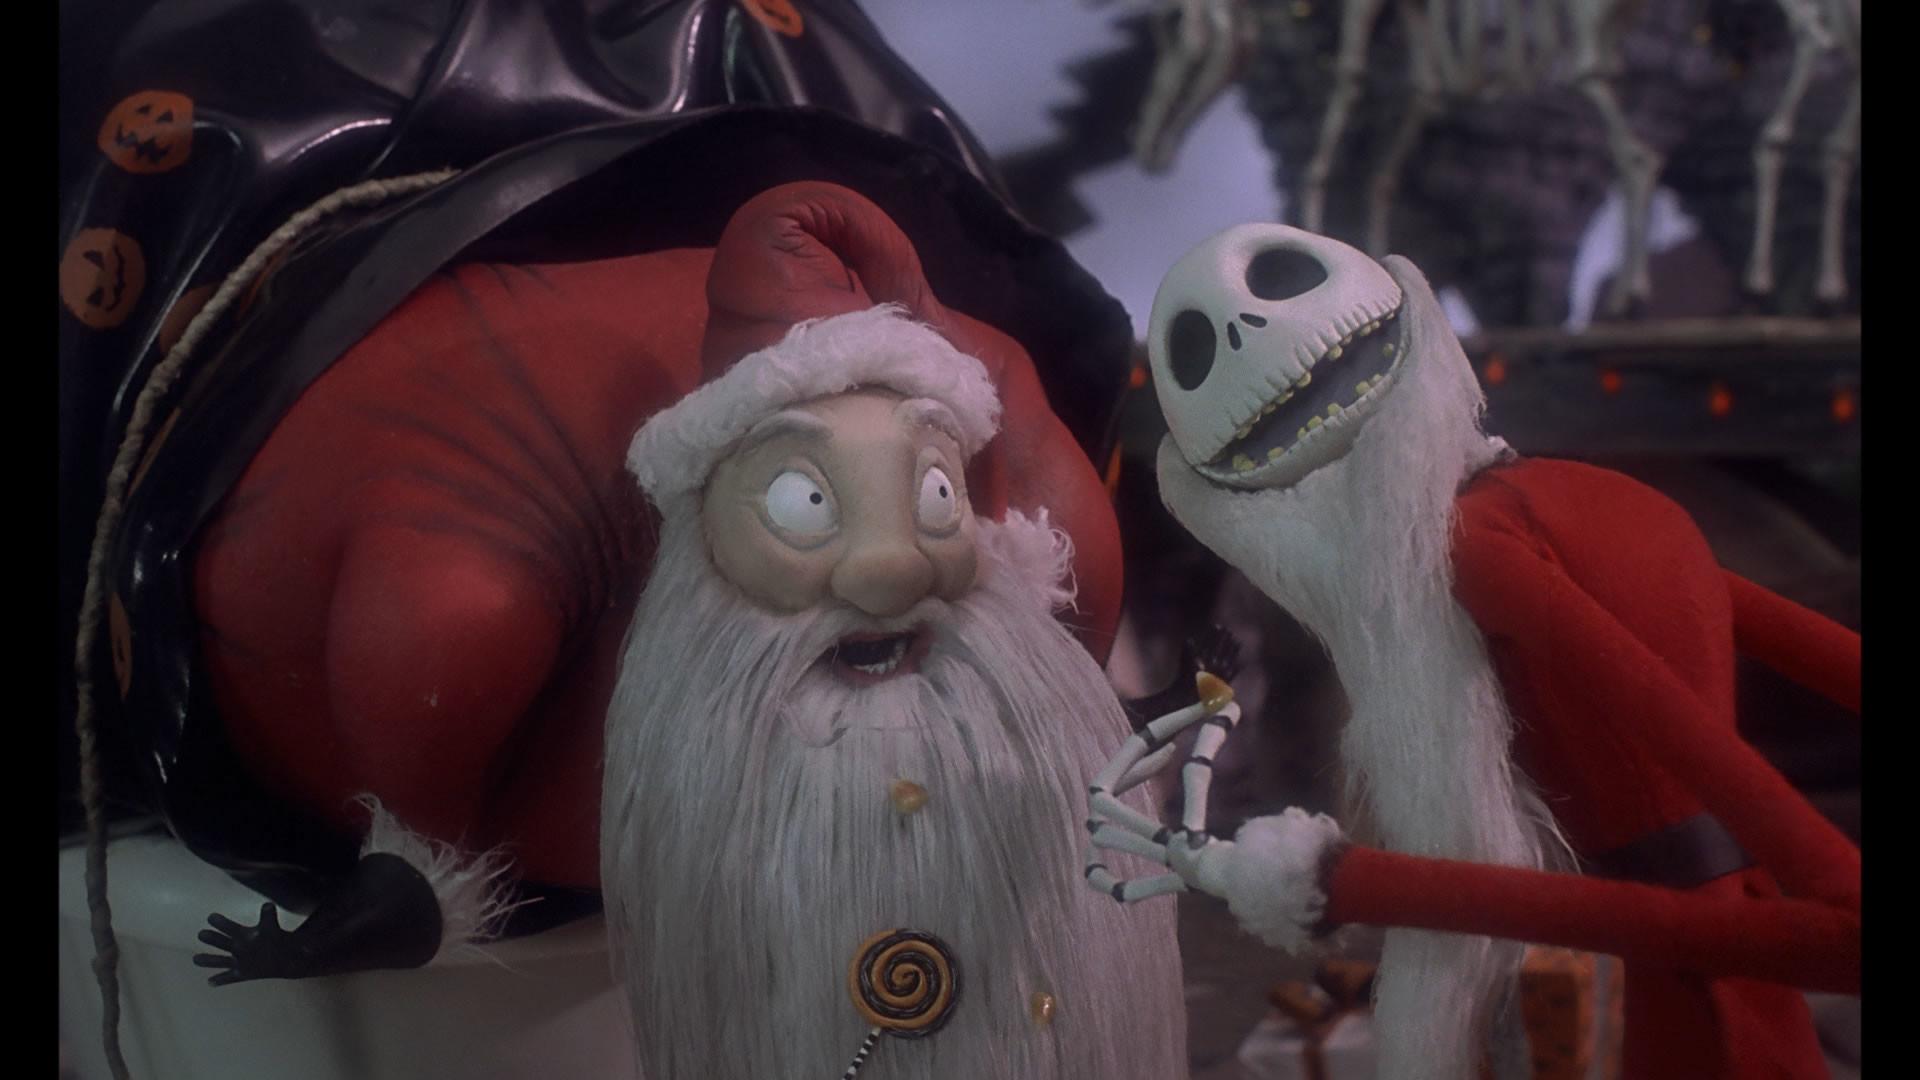 the-nightmare-before-christmas-jack-skellington-santa-claus